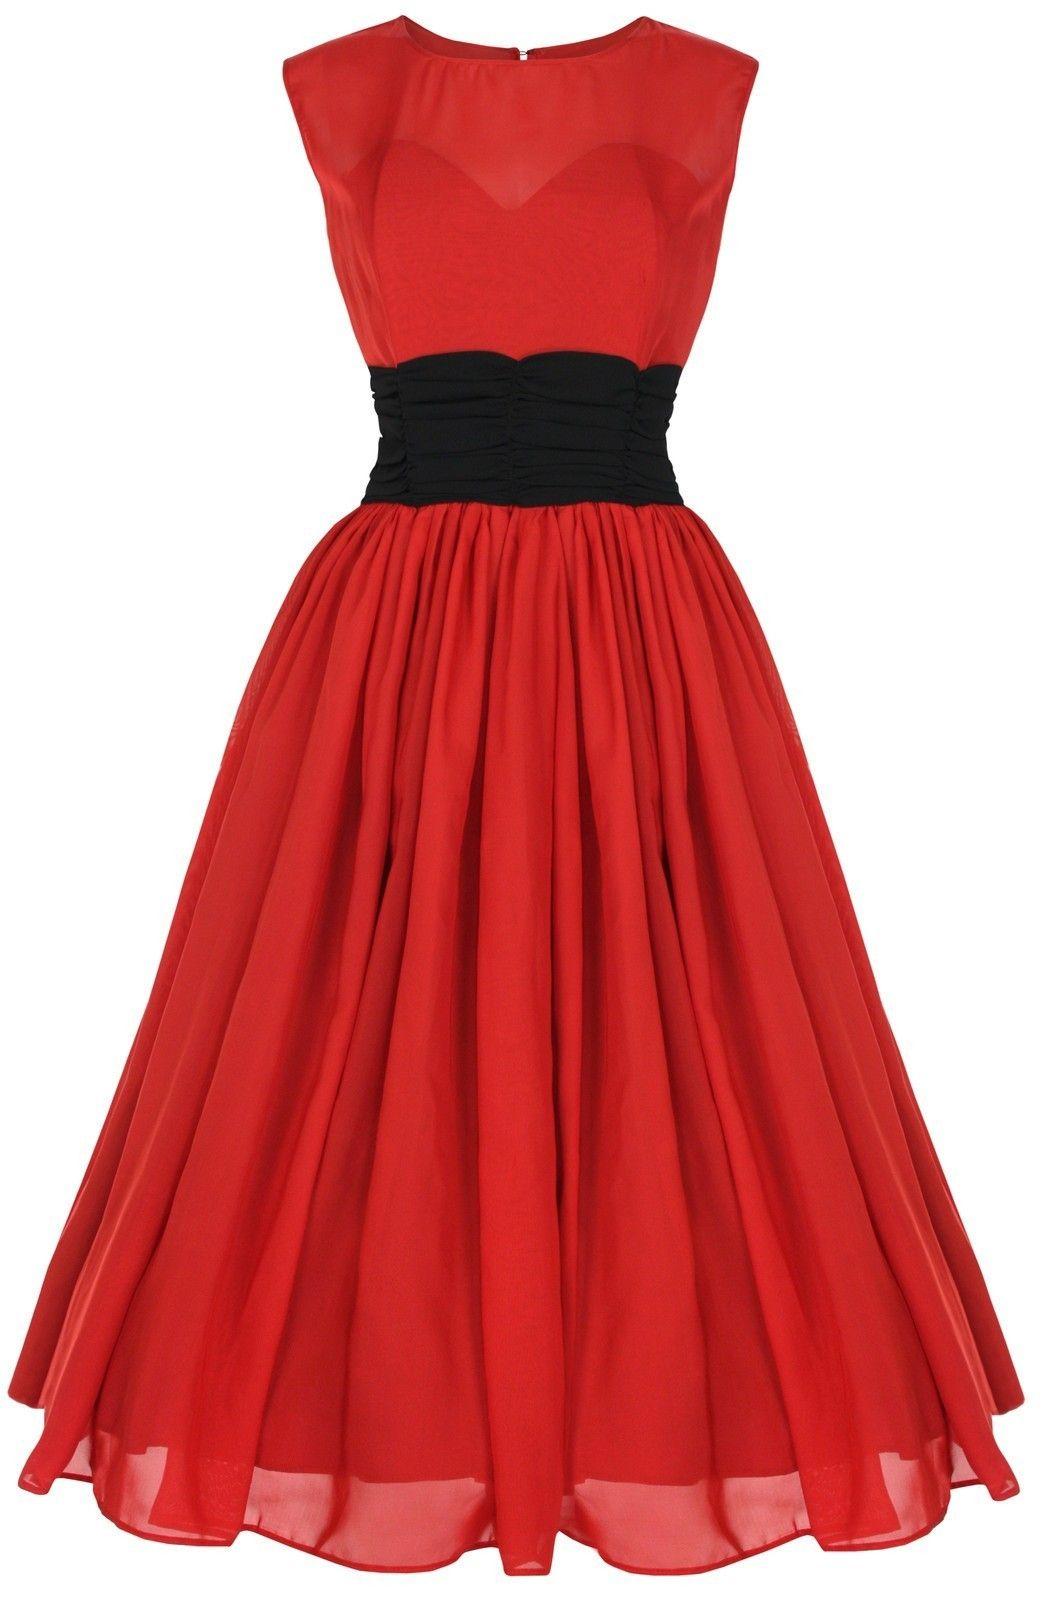 New lindy bop classic elegant vintage s chiffon prom dress ball